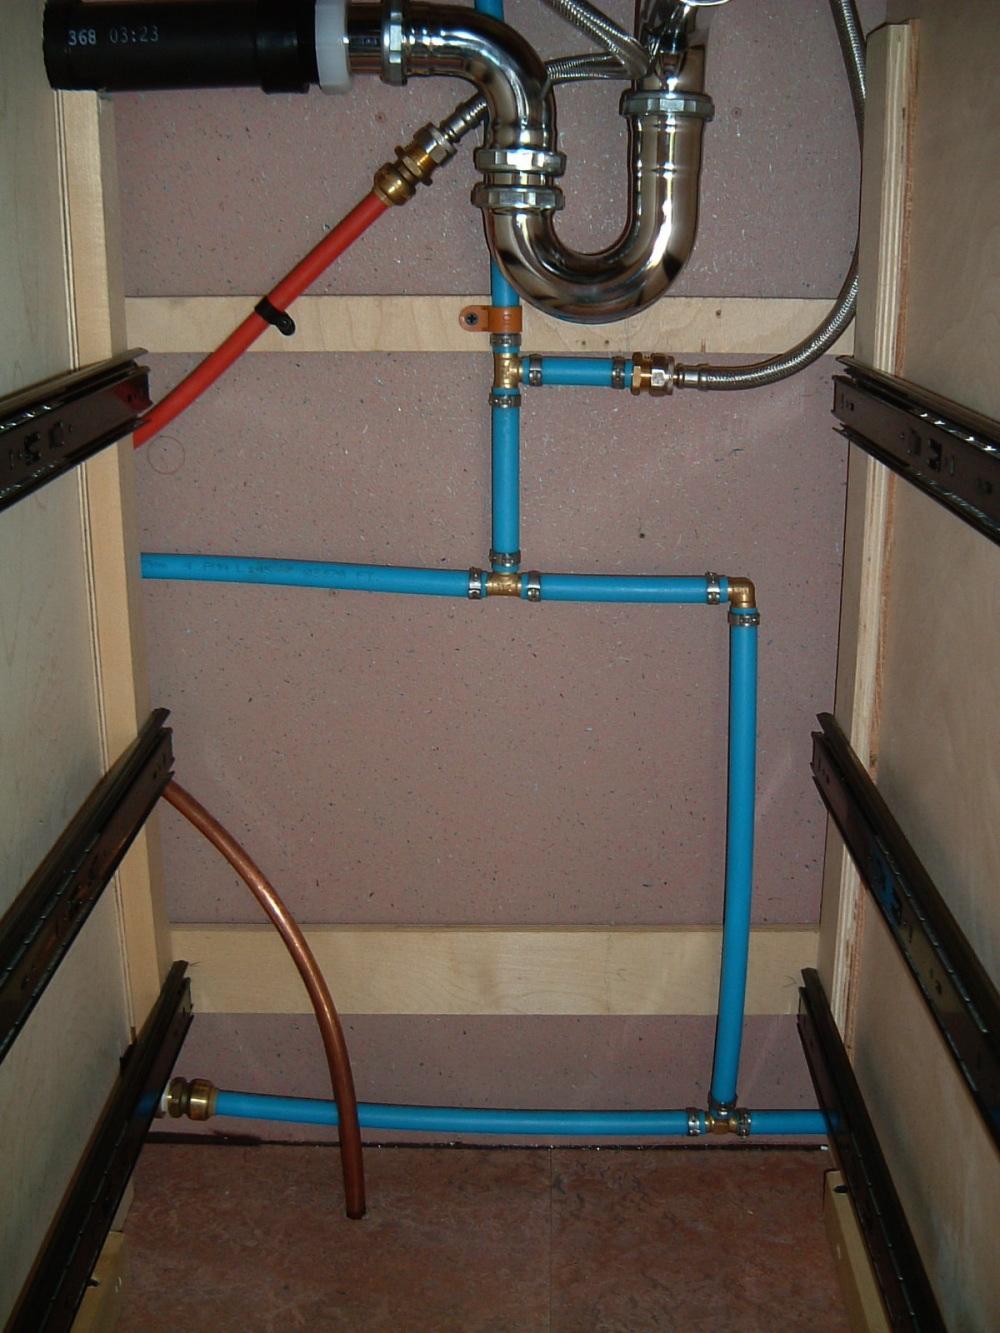 pex plumbing diagram bathroom 1969 mustang dash wiring - vintage airstream